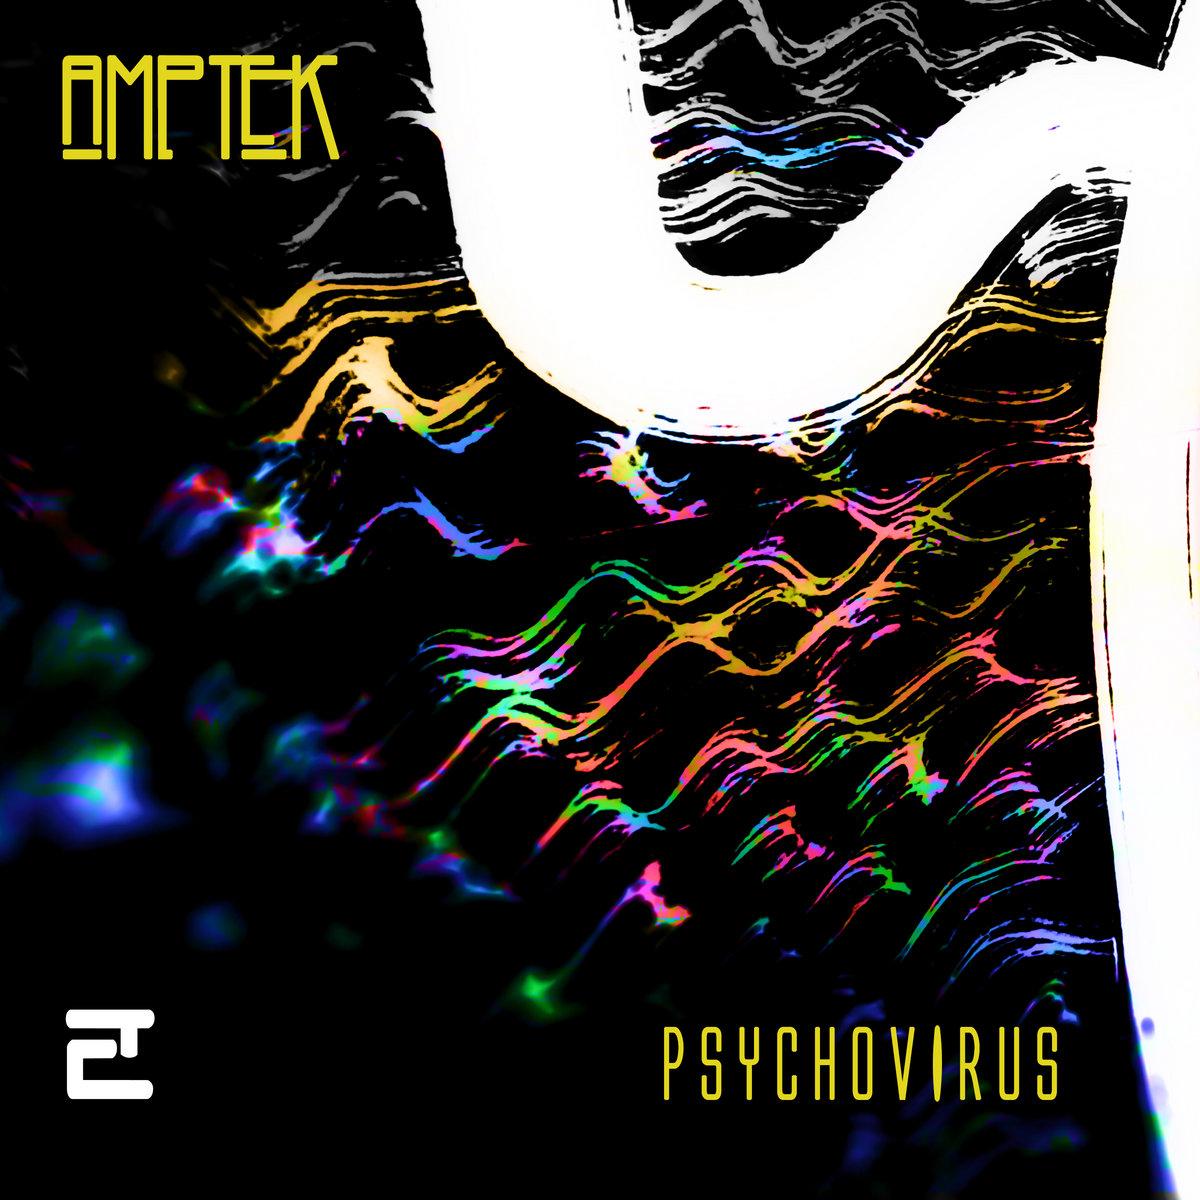 PSYCHOVIRUS is AMPTEK's new album